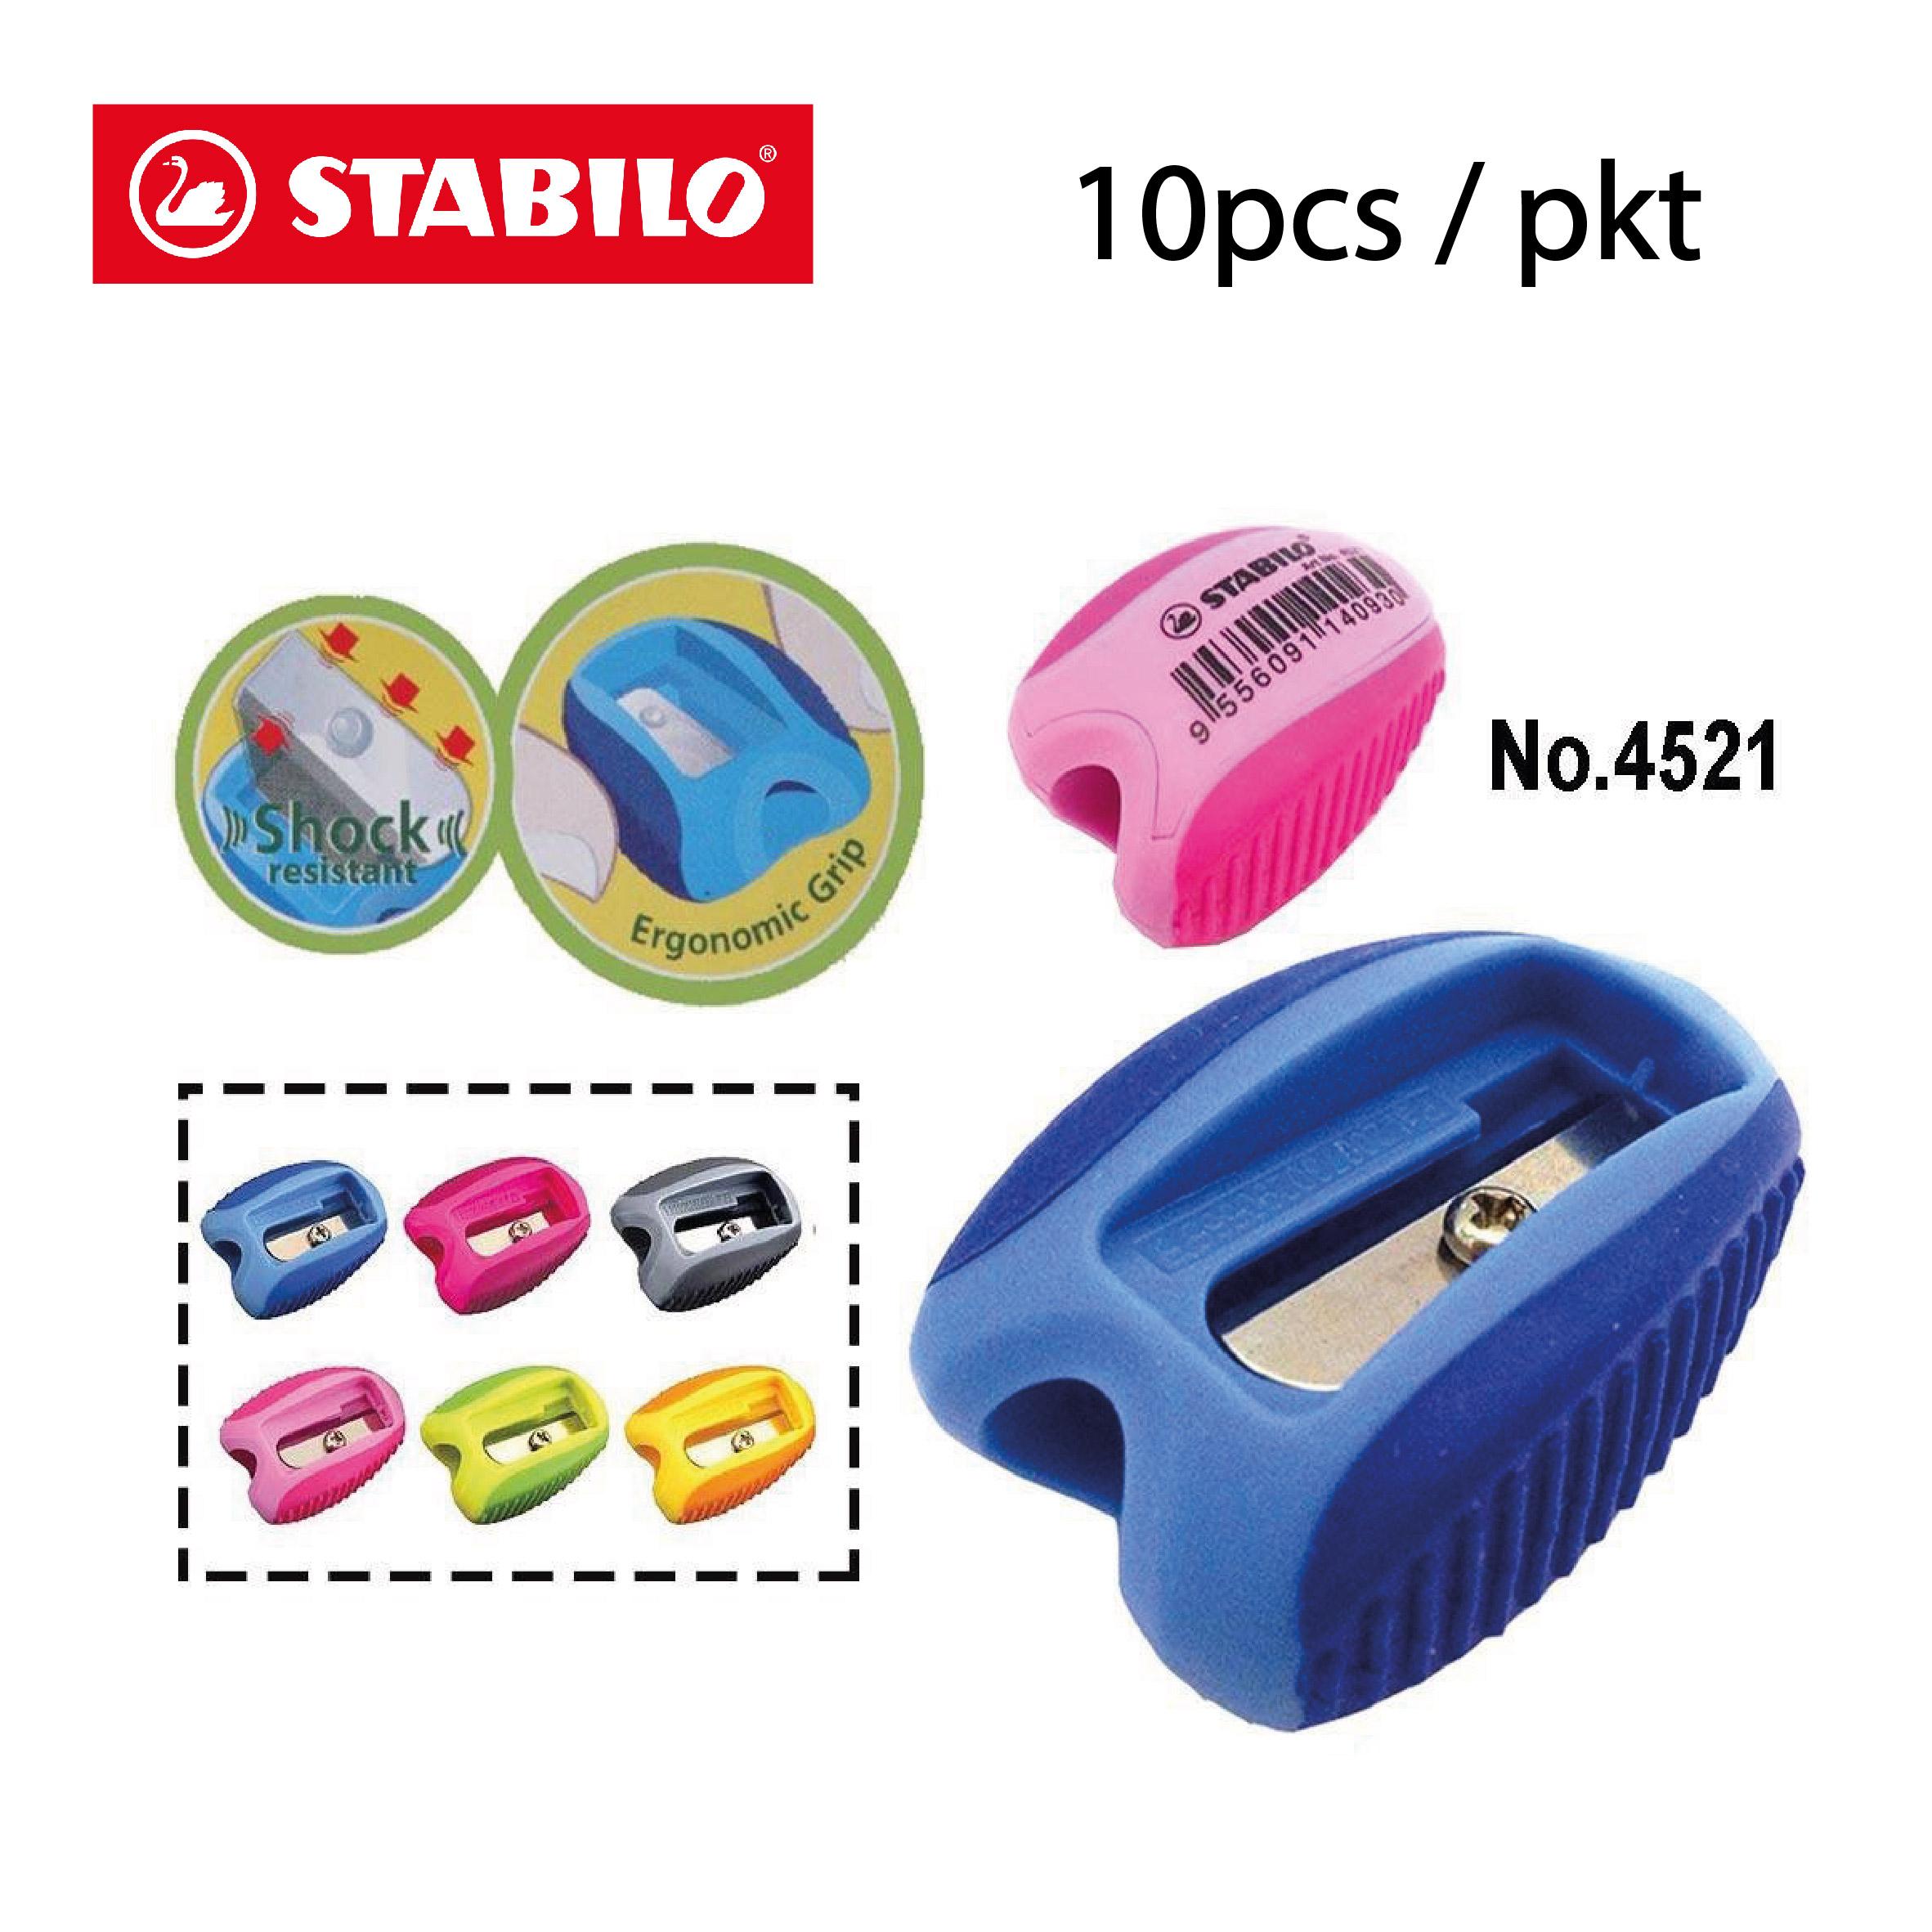 Stabilo X-Shock Sharpener 10pcs Bundle